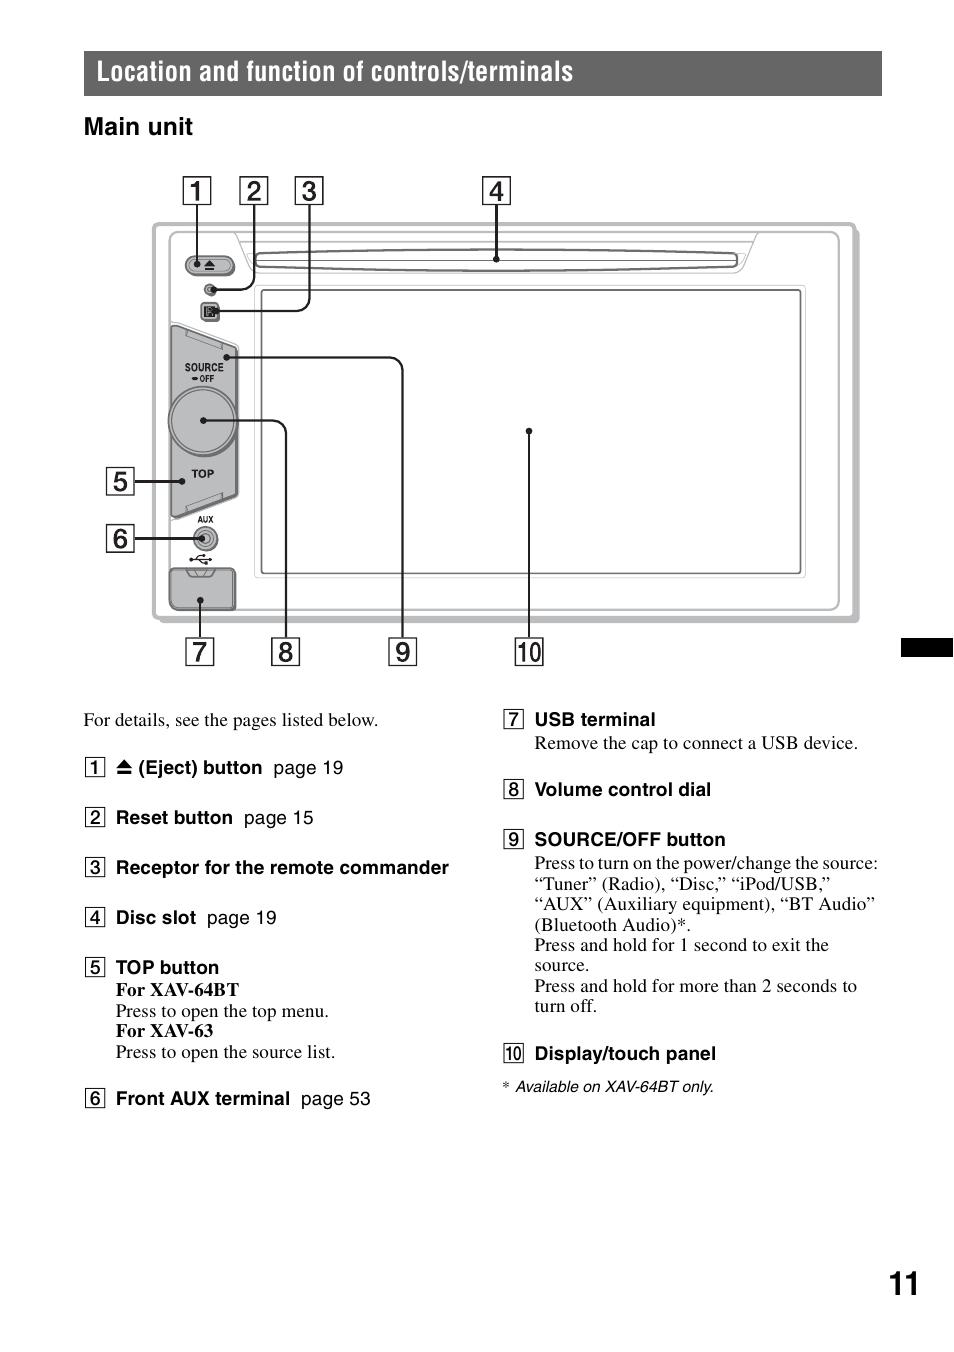 medium resolution of location and function of controls terminals main unit sony xav 63 sony xav 60 manual sony xav 63 wiring diagram